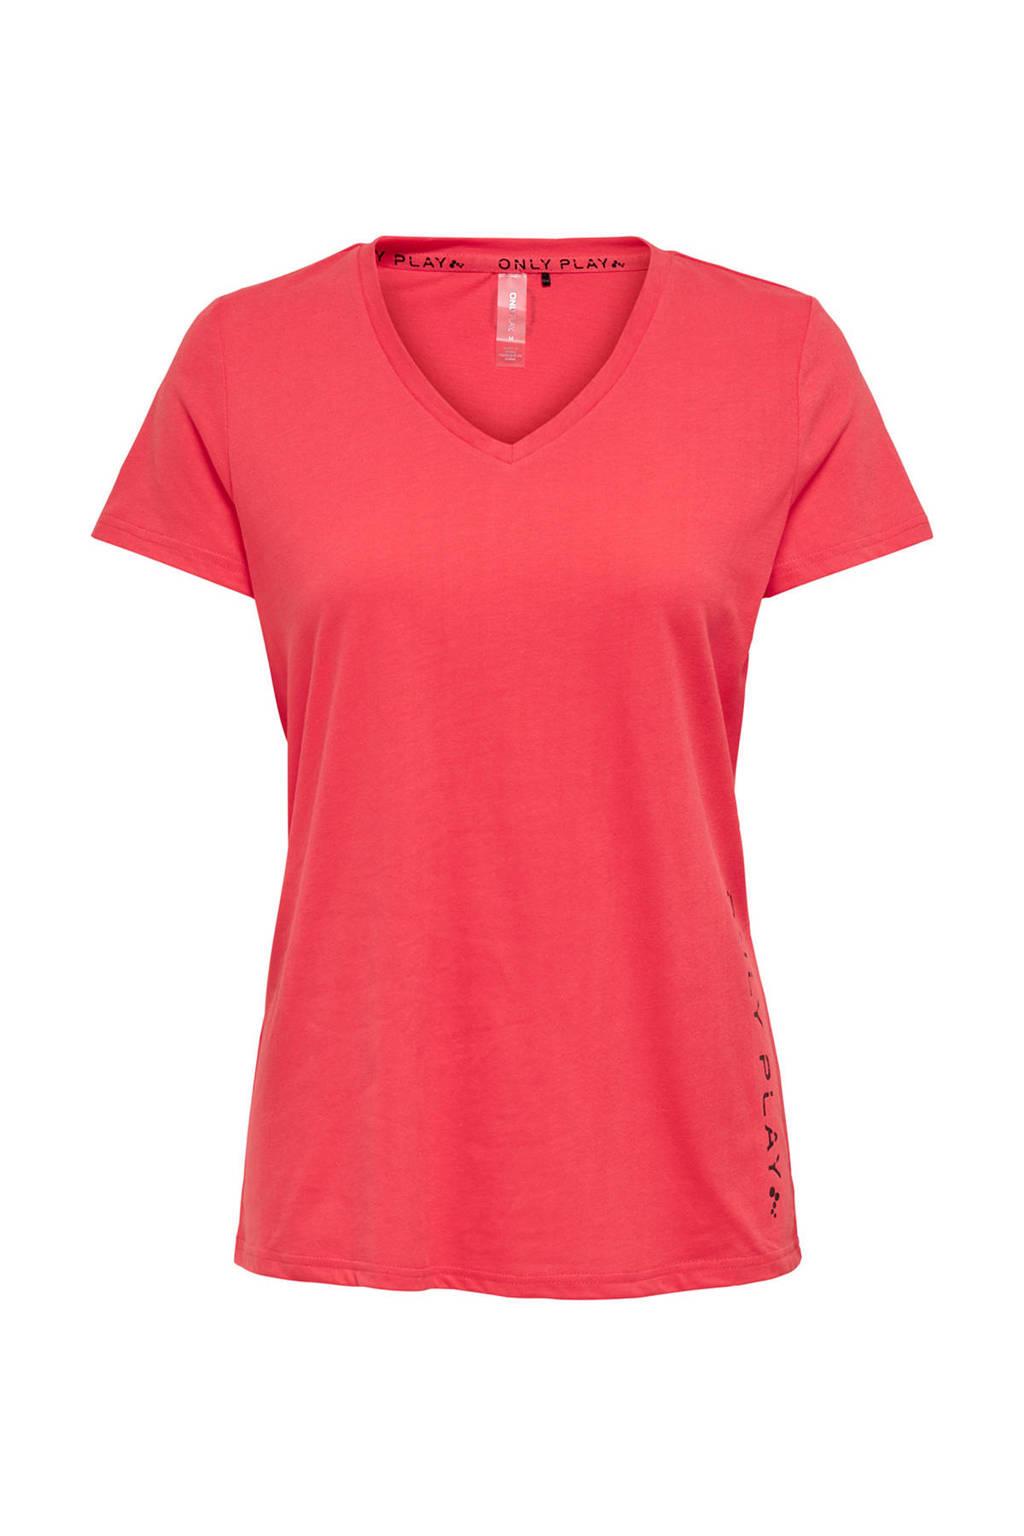 ONLY PLAY sport T-shirt koraalrood, Koraalrood